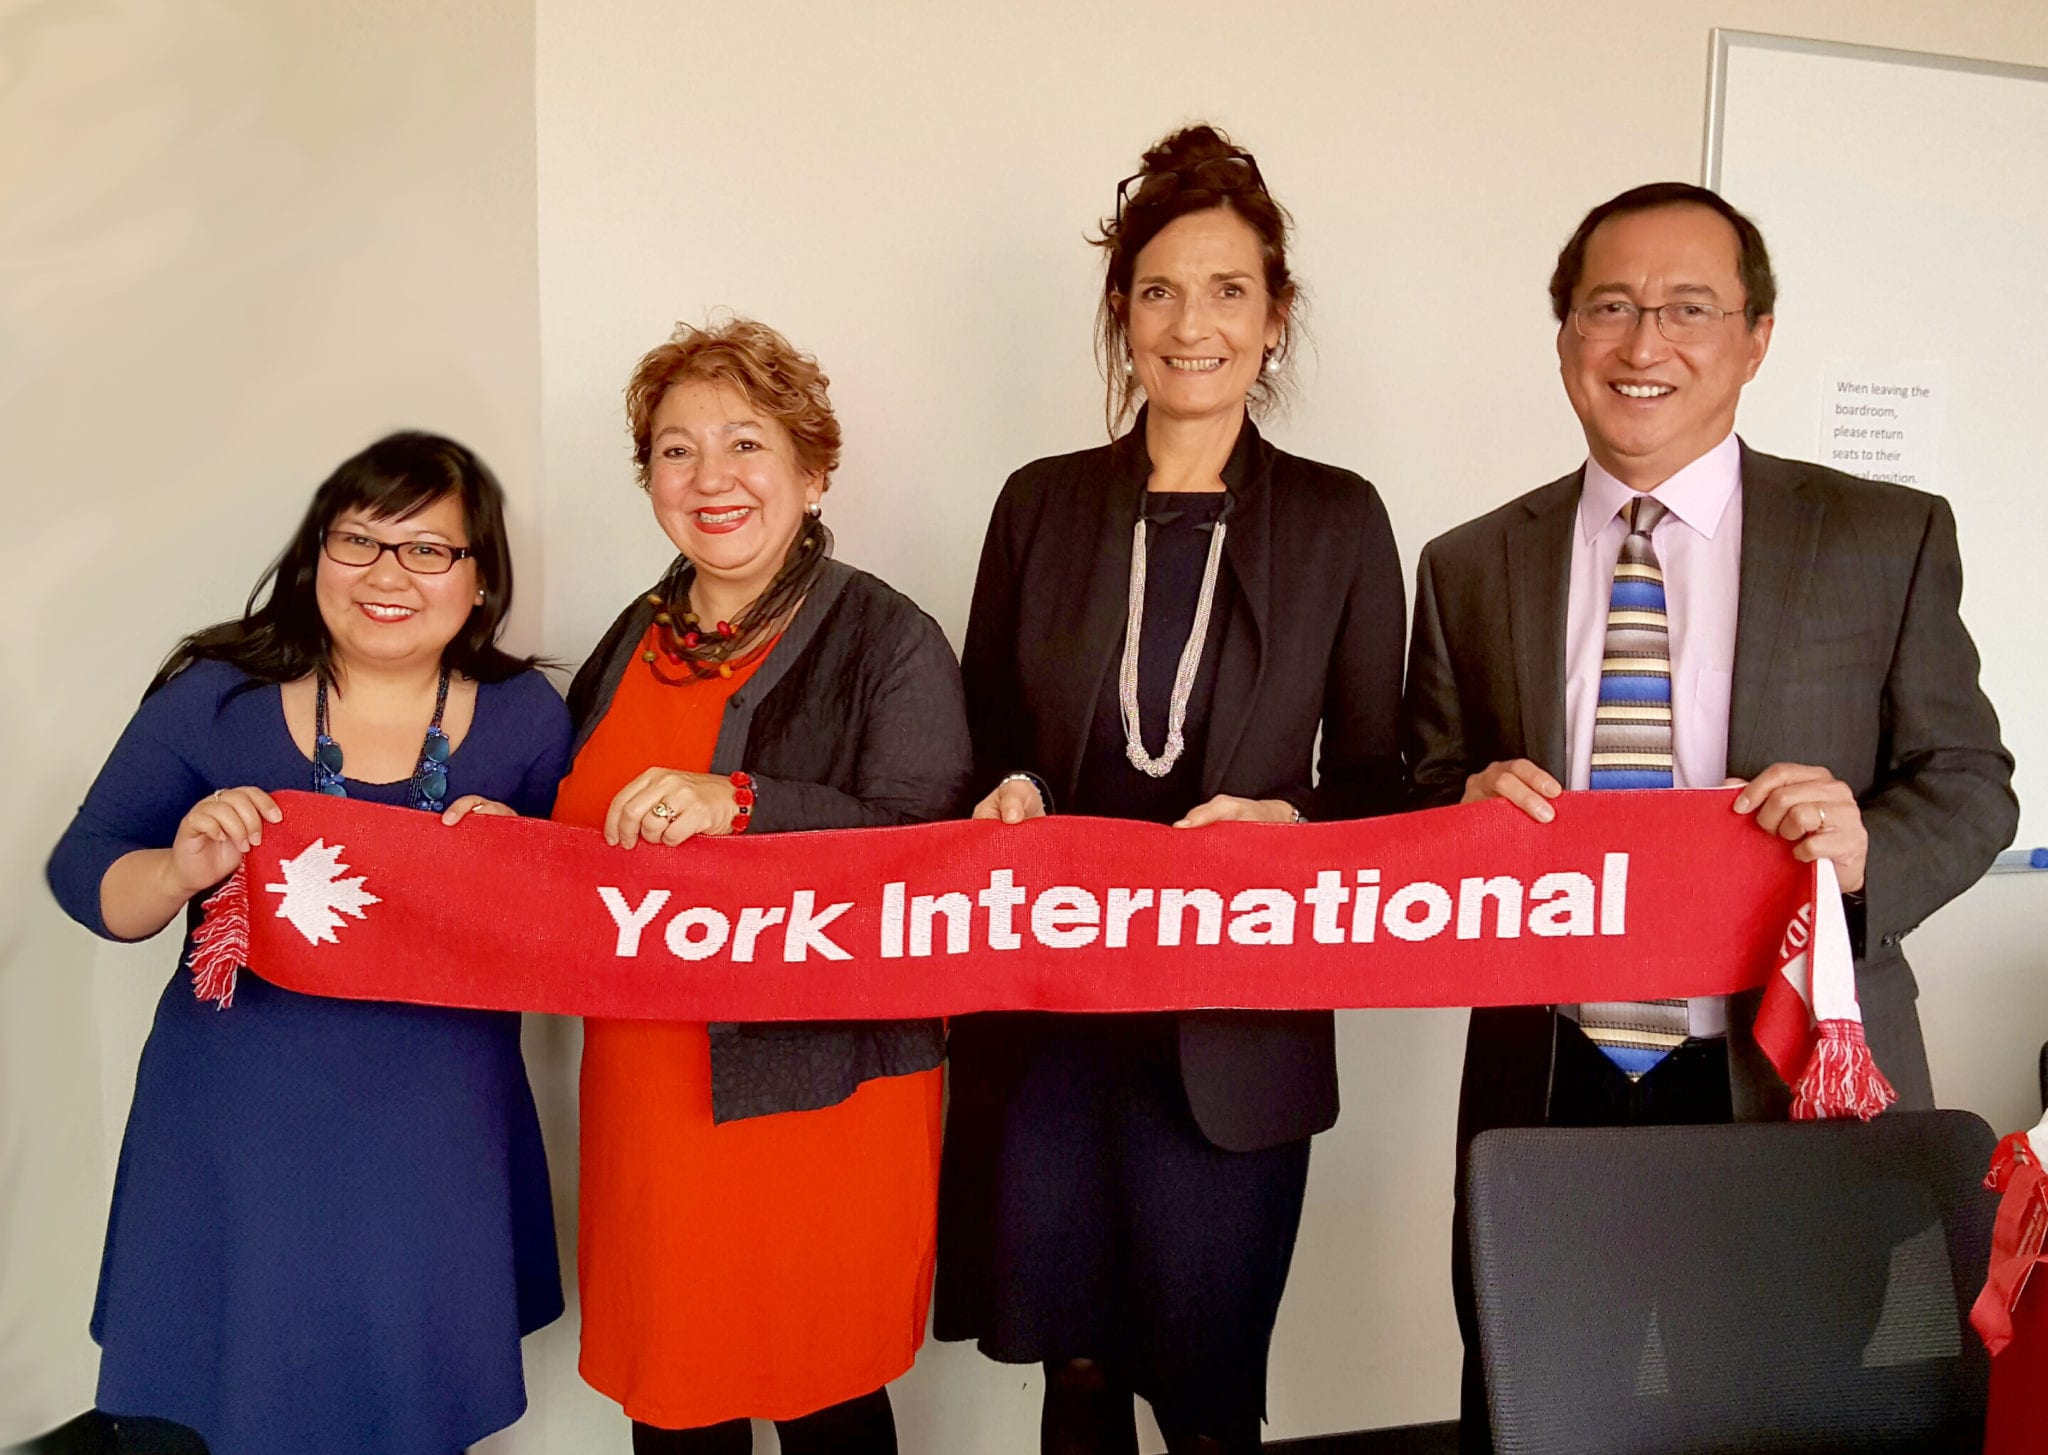 York International, School of Administrative Studies and ZHAW School Of Management and Law, Switzerland, Nov 2016